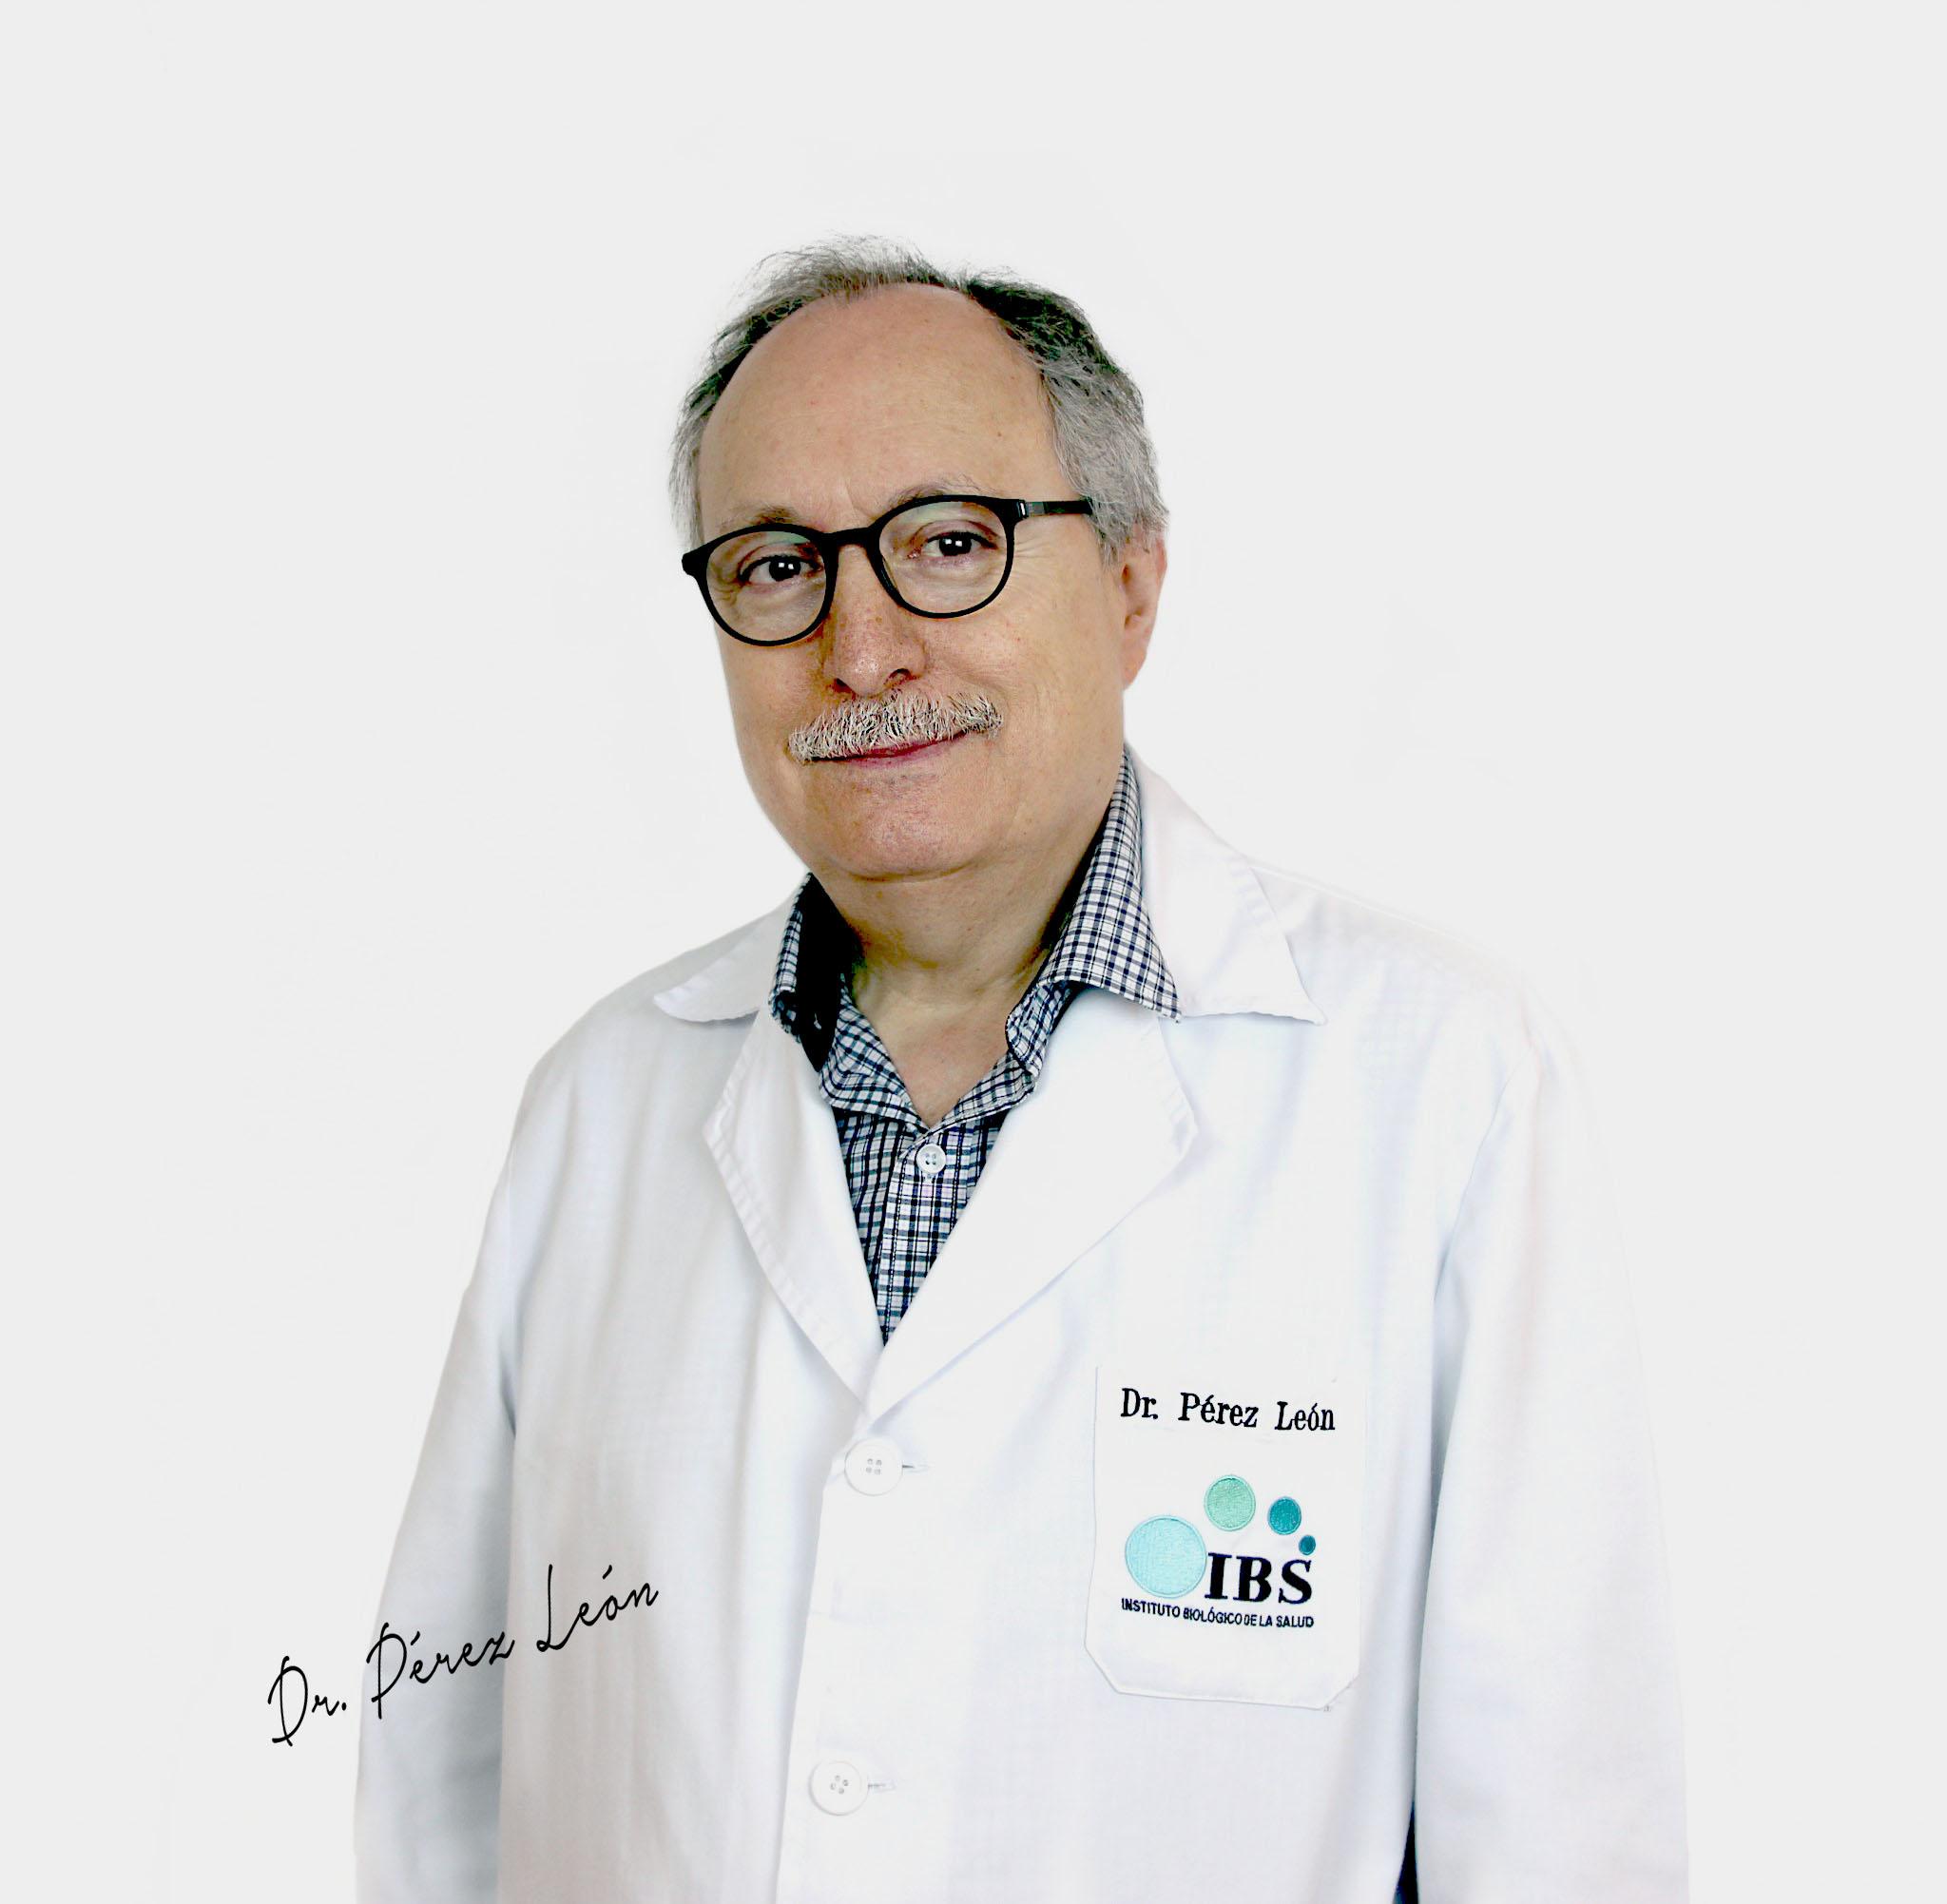 doctor perez leon, director Médico IEBS